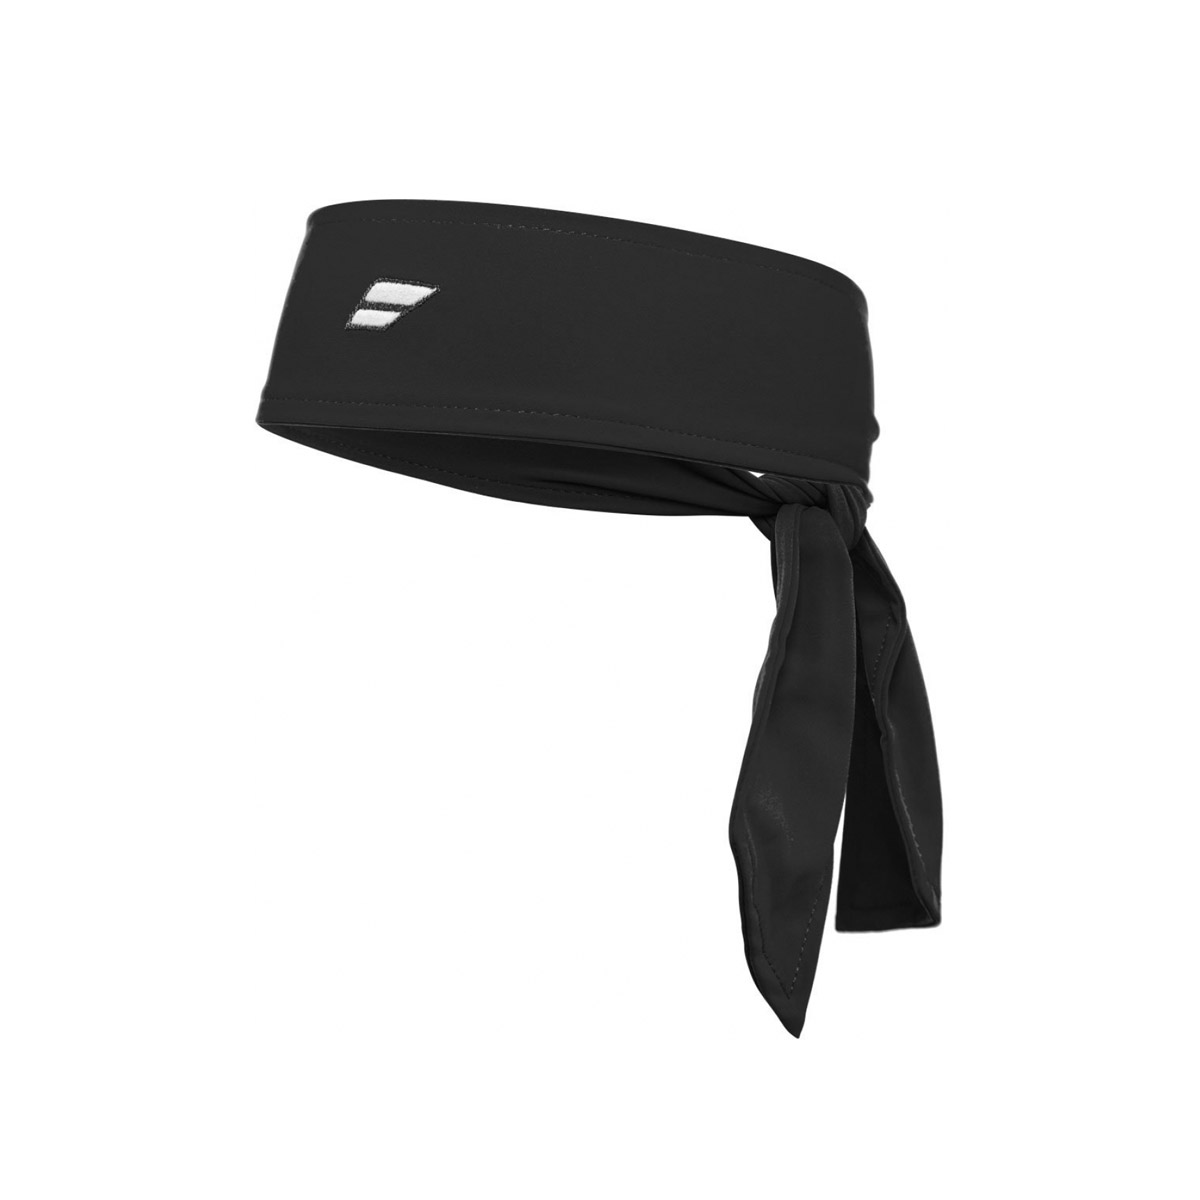 Babolat Unisex Bandana - Black - Peake Performance Sports be3962aaa26d